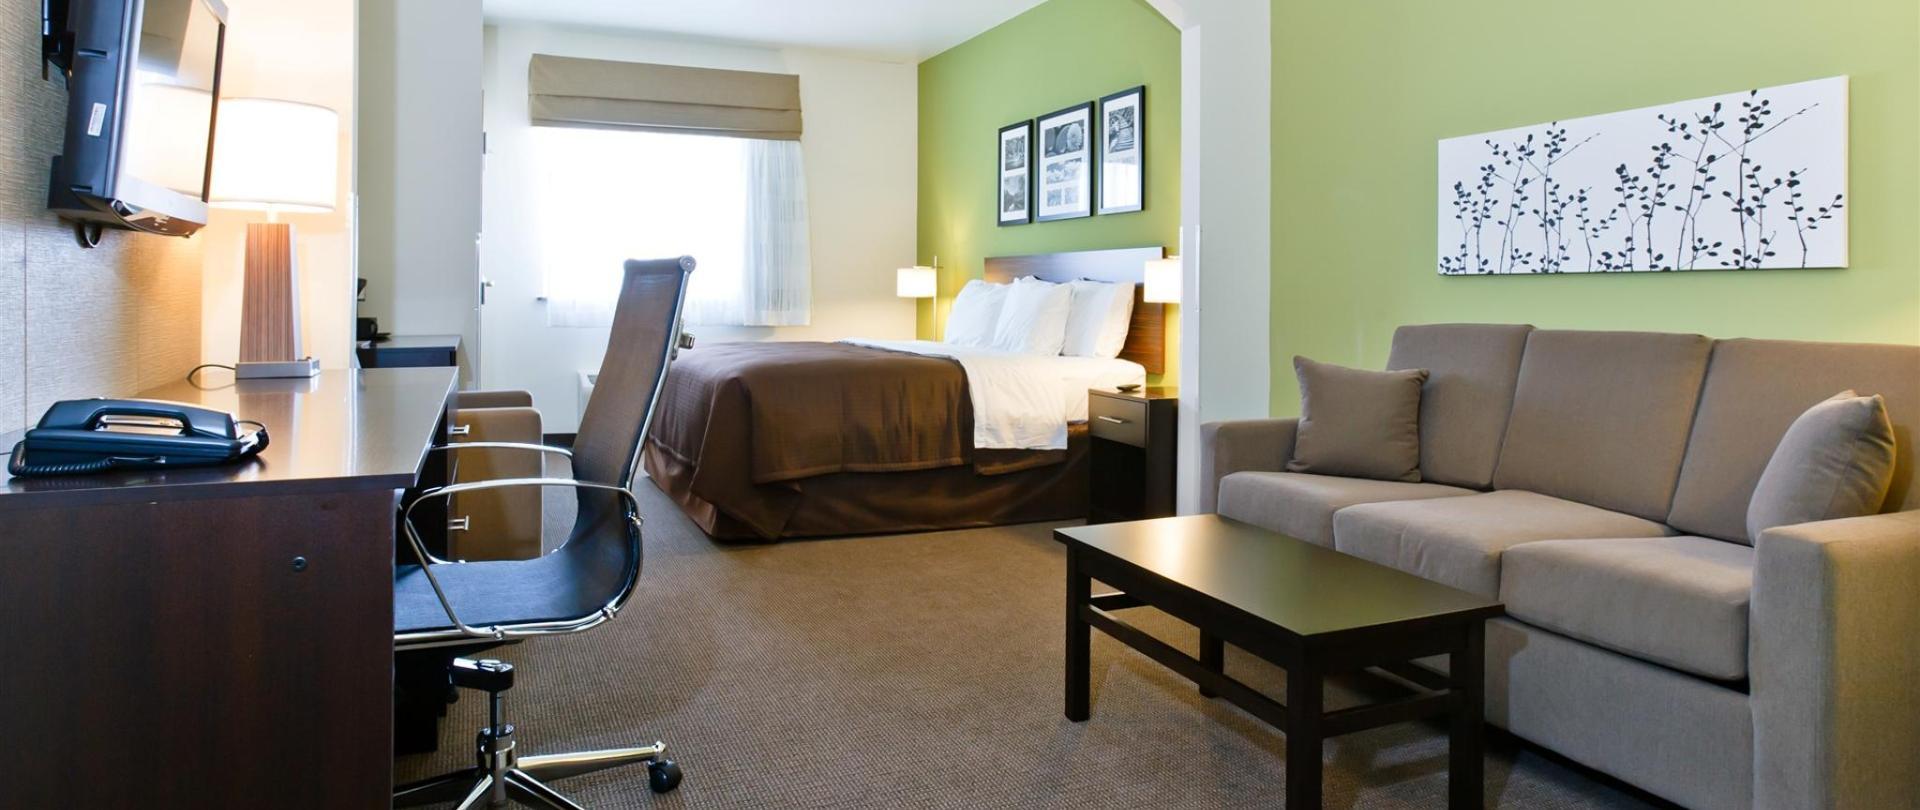 ks148-sleep-inn-king-suite-2.jpg